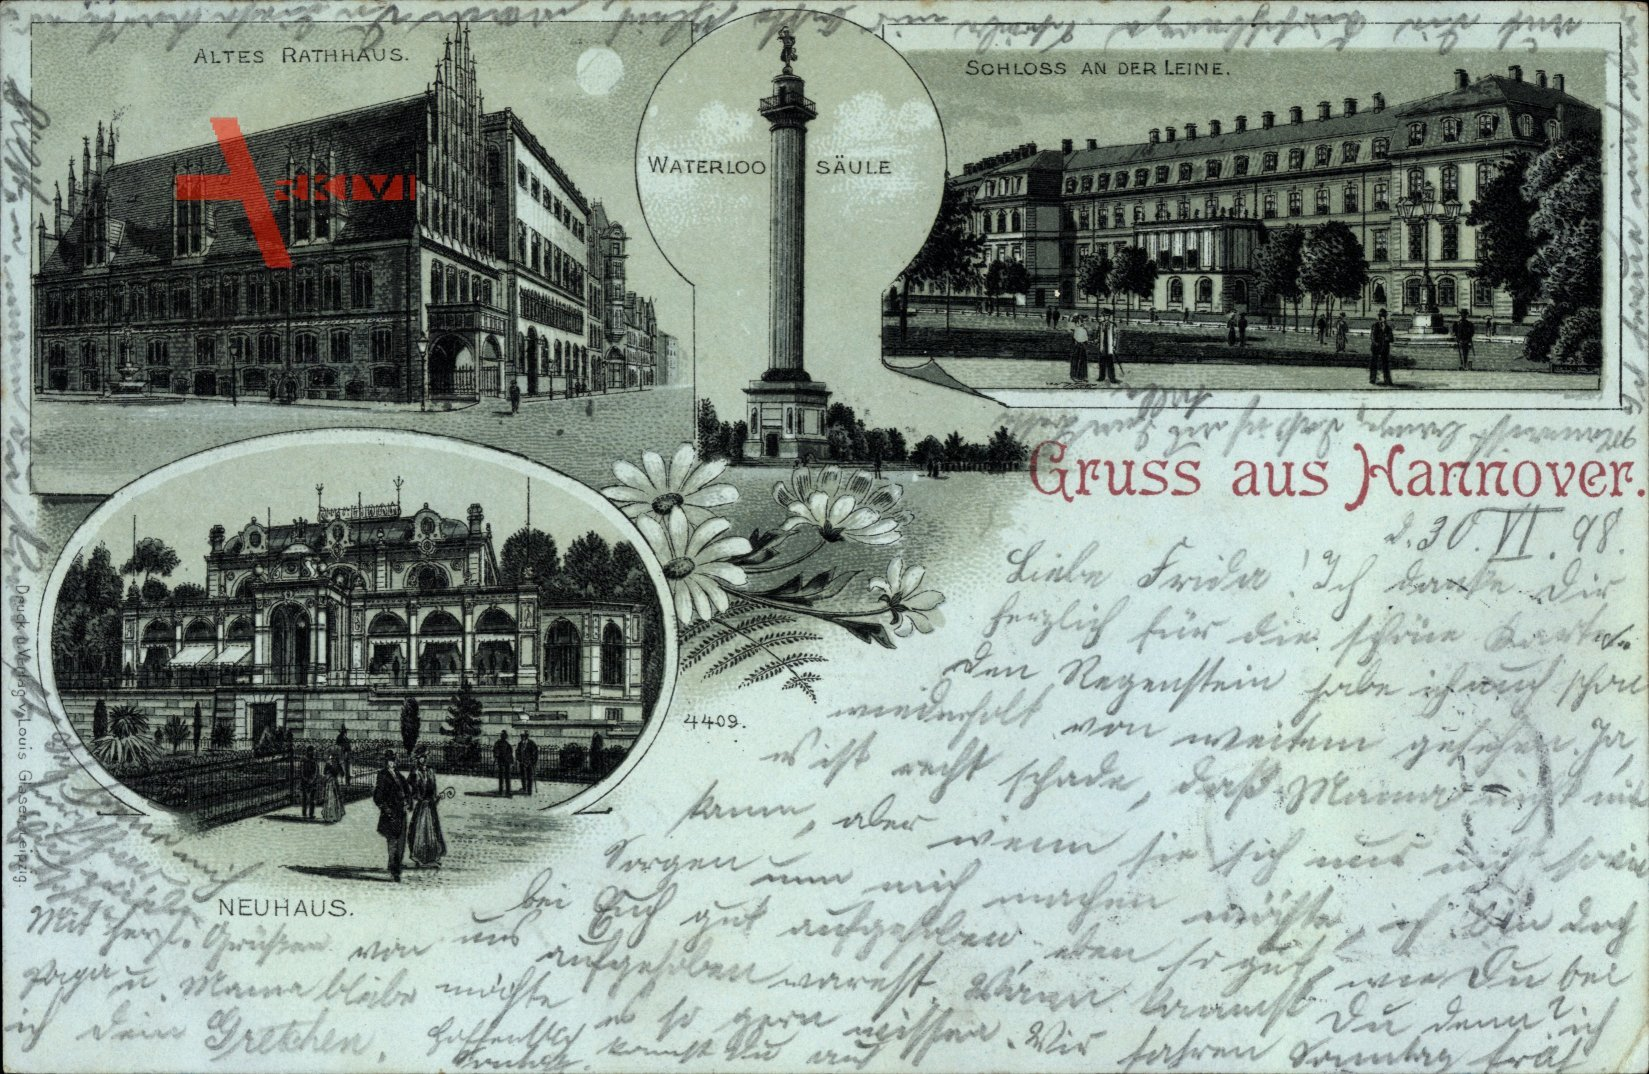 Hannover in Niedersachsen, Neuhaus, Waterloo Säule, Schloss